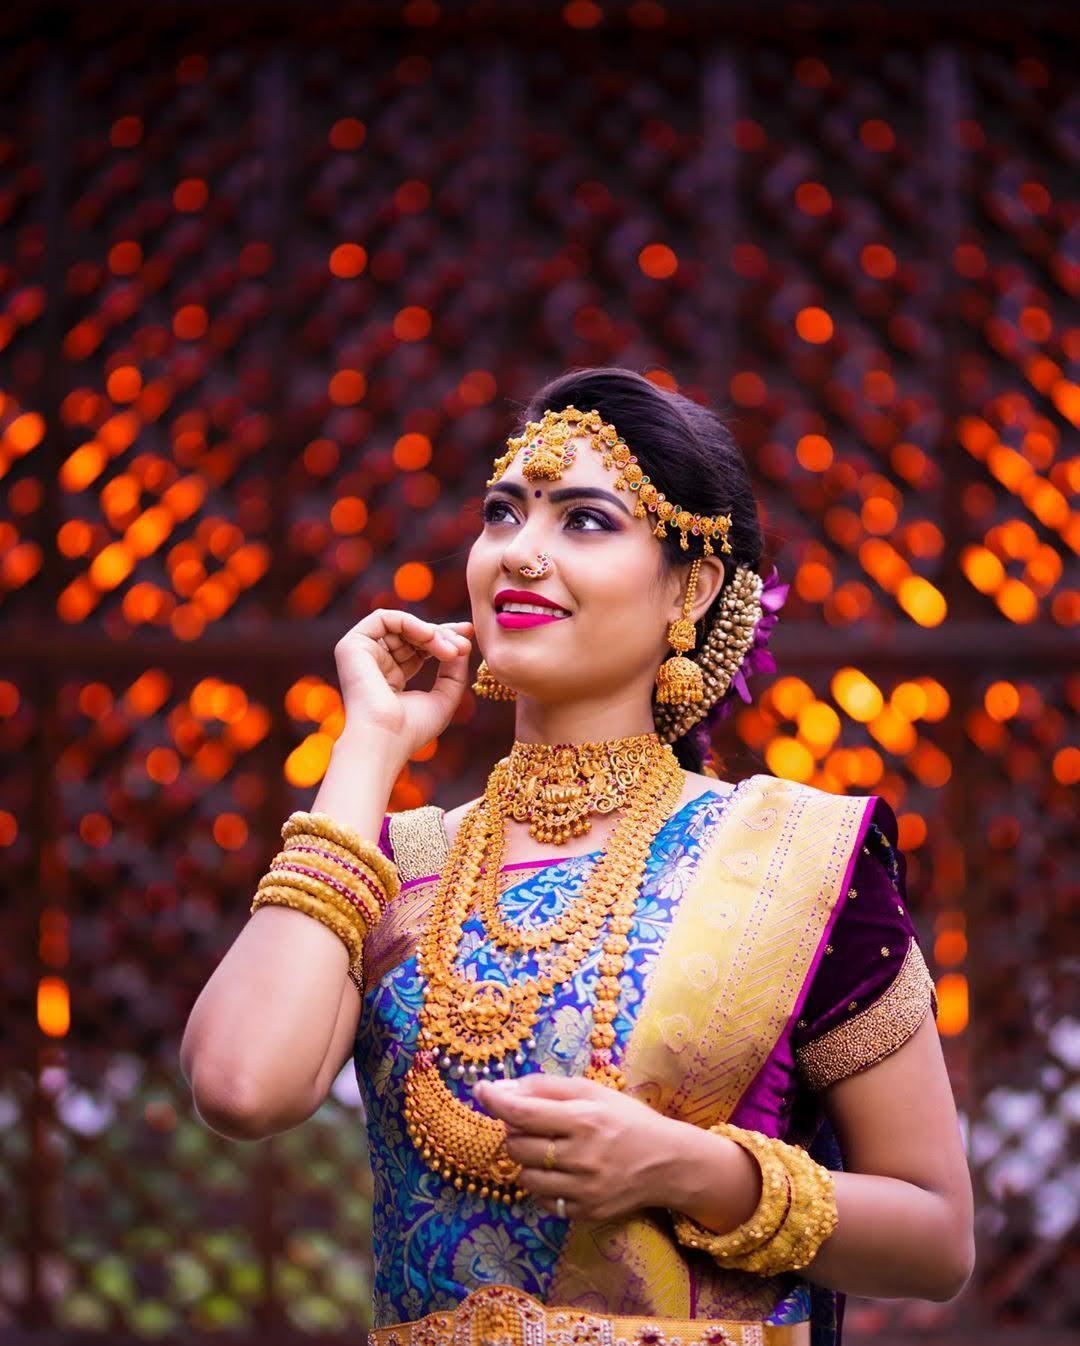 pavithra-janani-64717